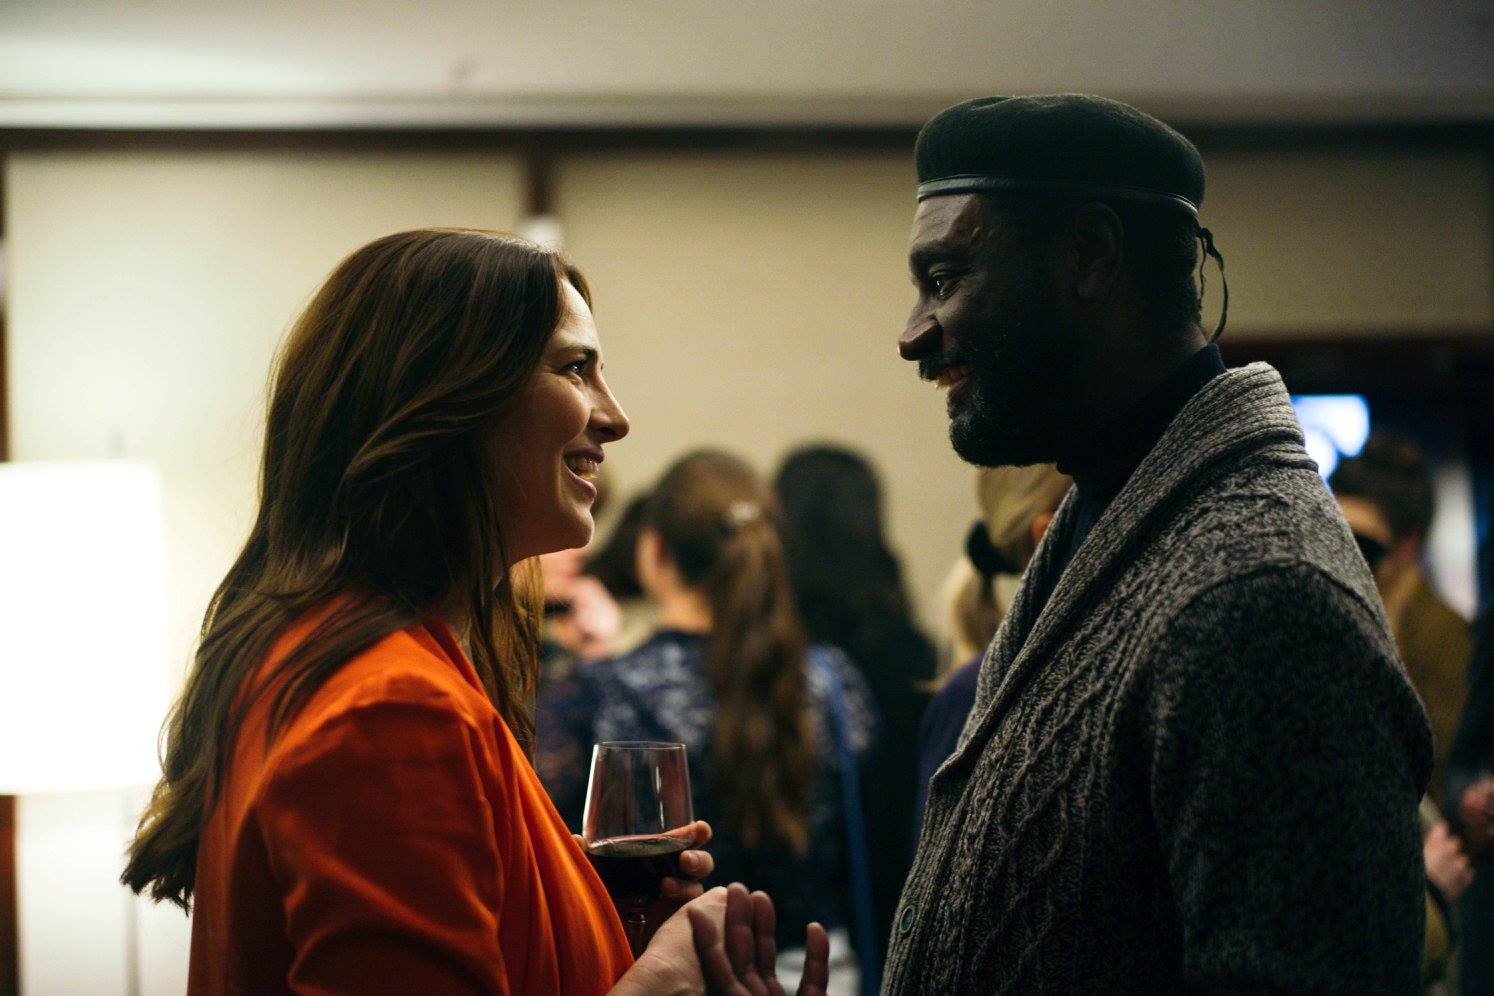 Haley Bishop and Stil Williams - Whirlpool Bulgari screening.jpg